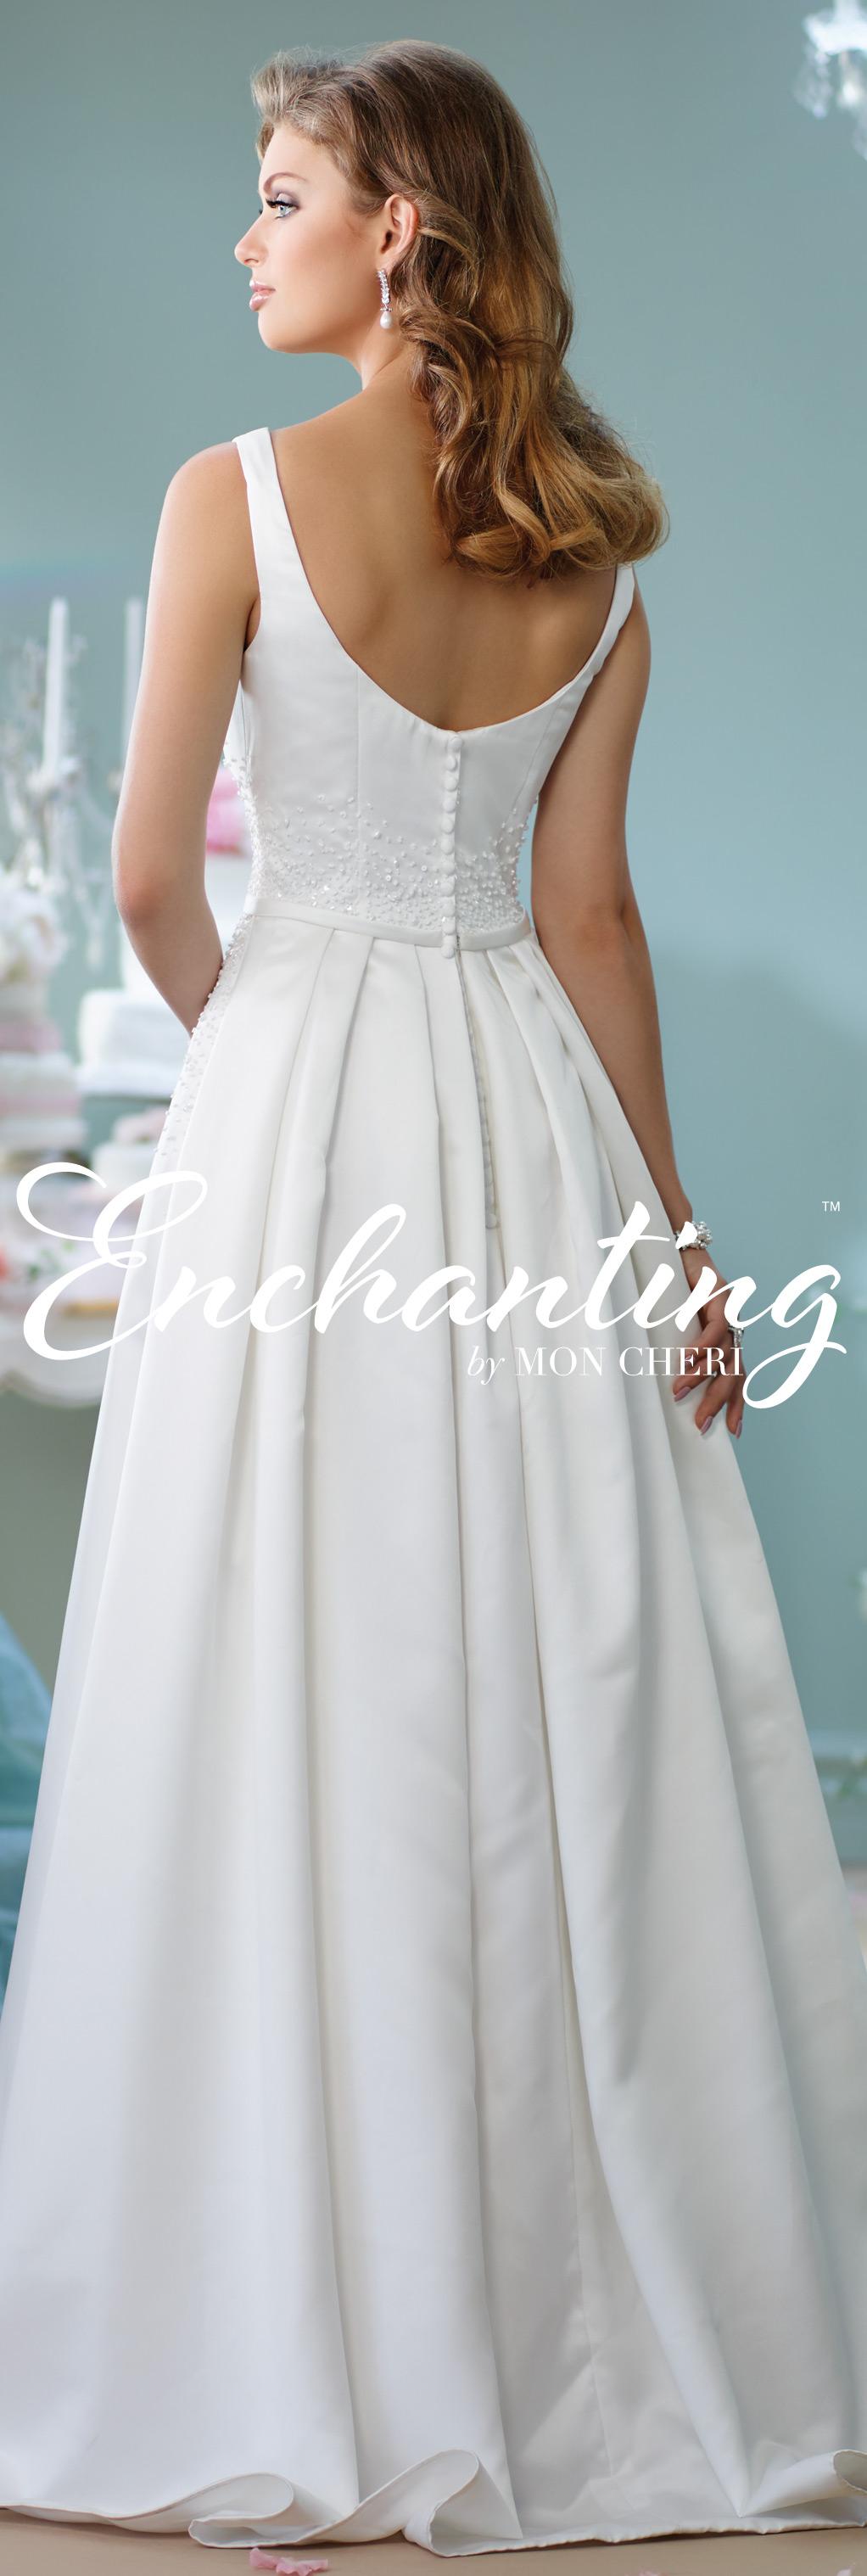 Modern wedding dresses by mon cheri enchanted wedding dress